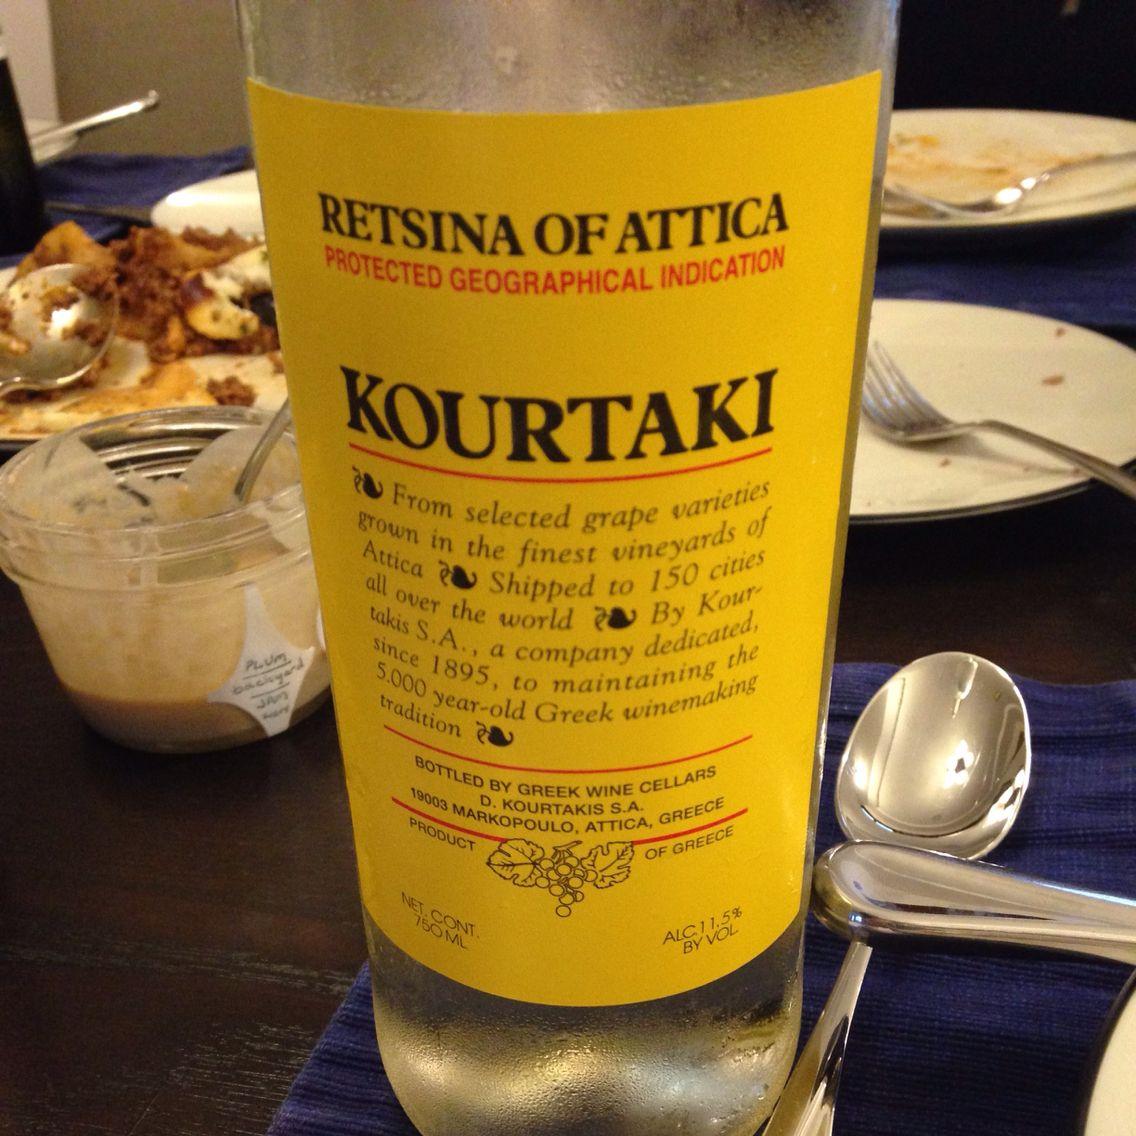 Greek Wine Cellars Gwc Kourtaki Retsina Of Attica Central